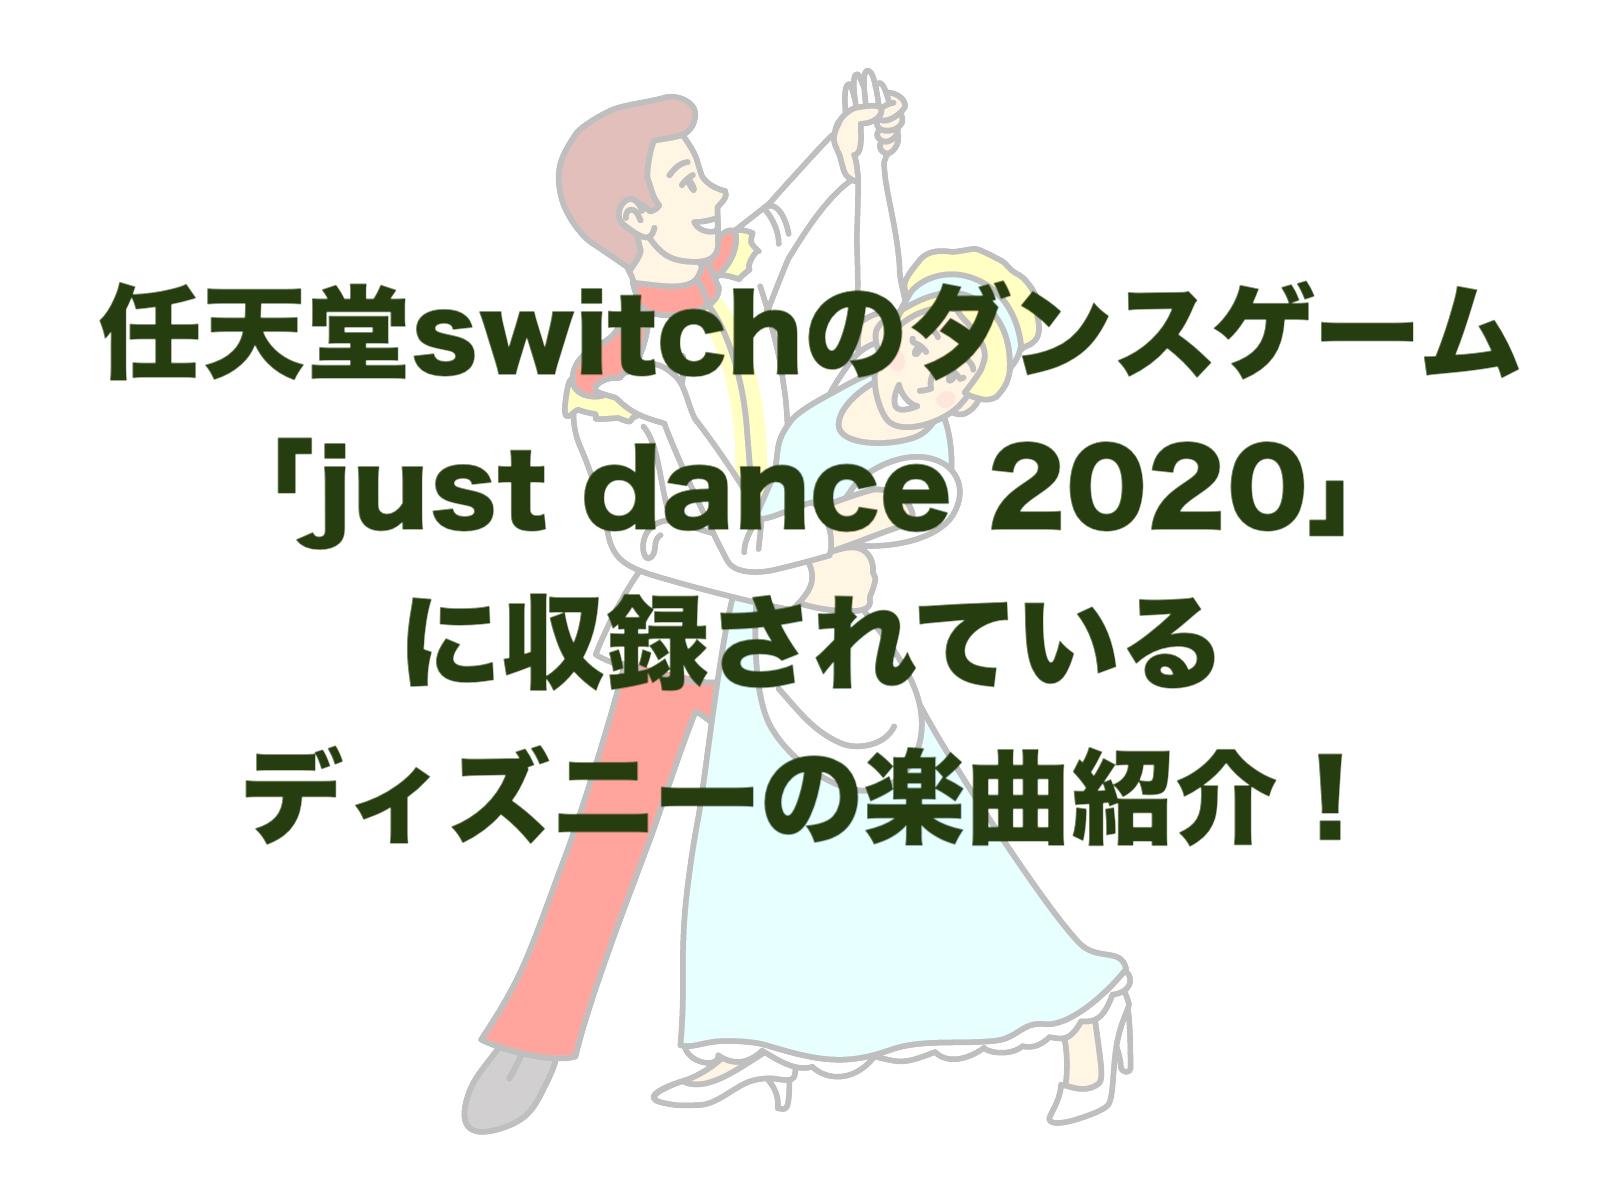 justdance2020ディズニー